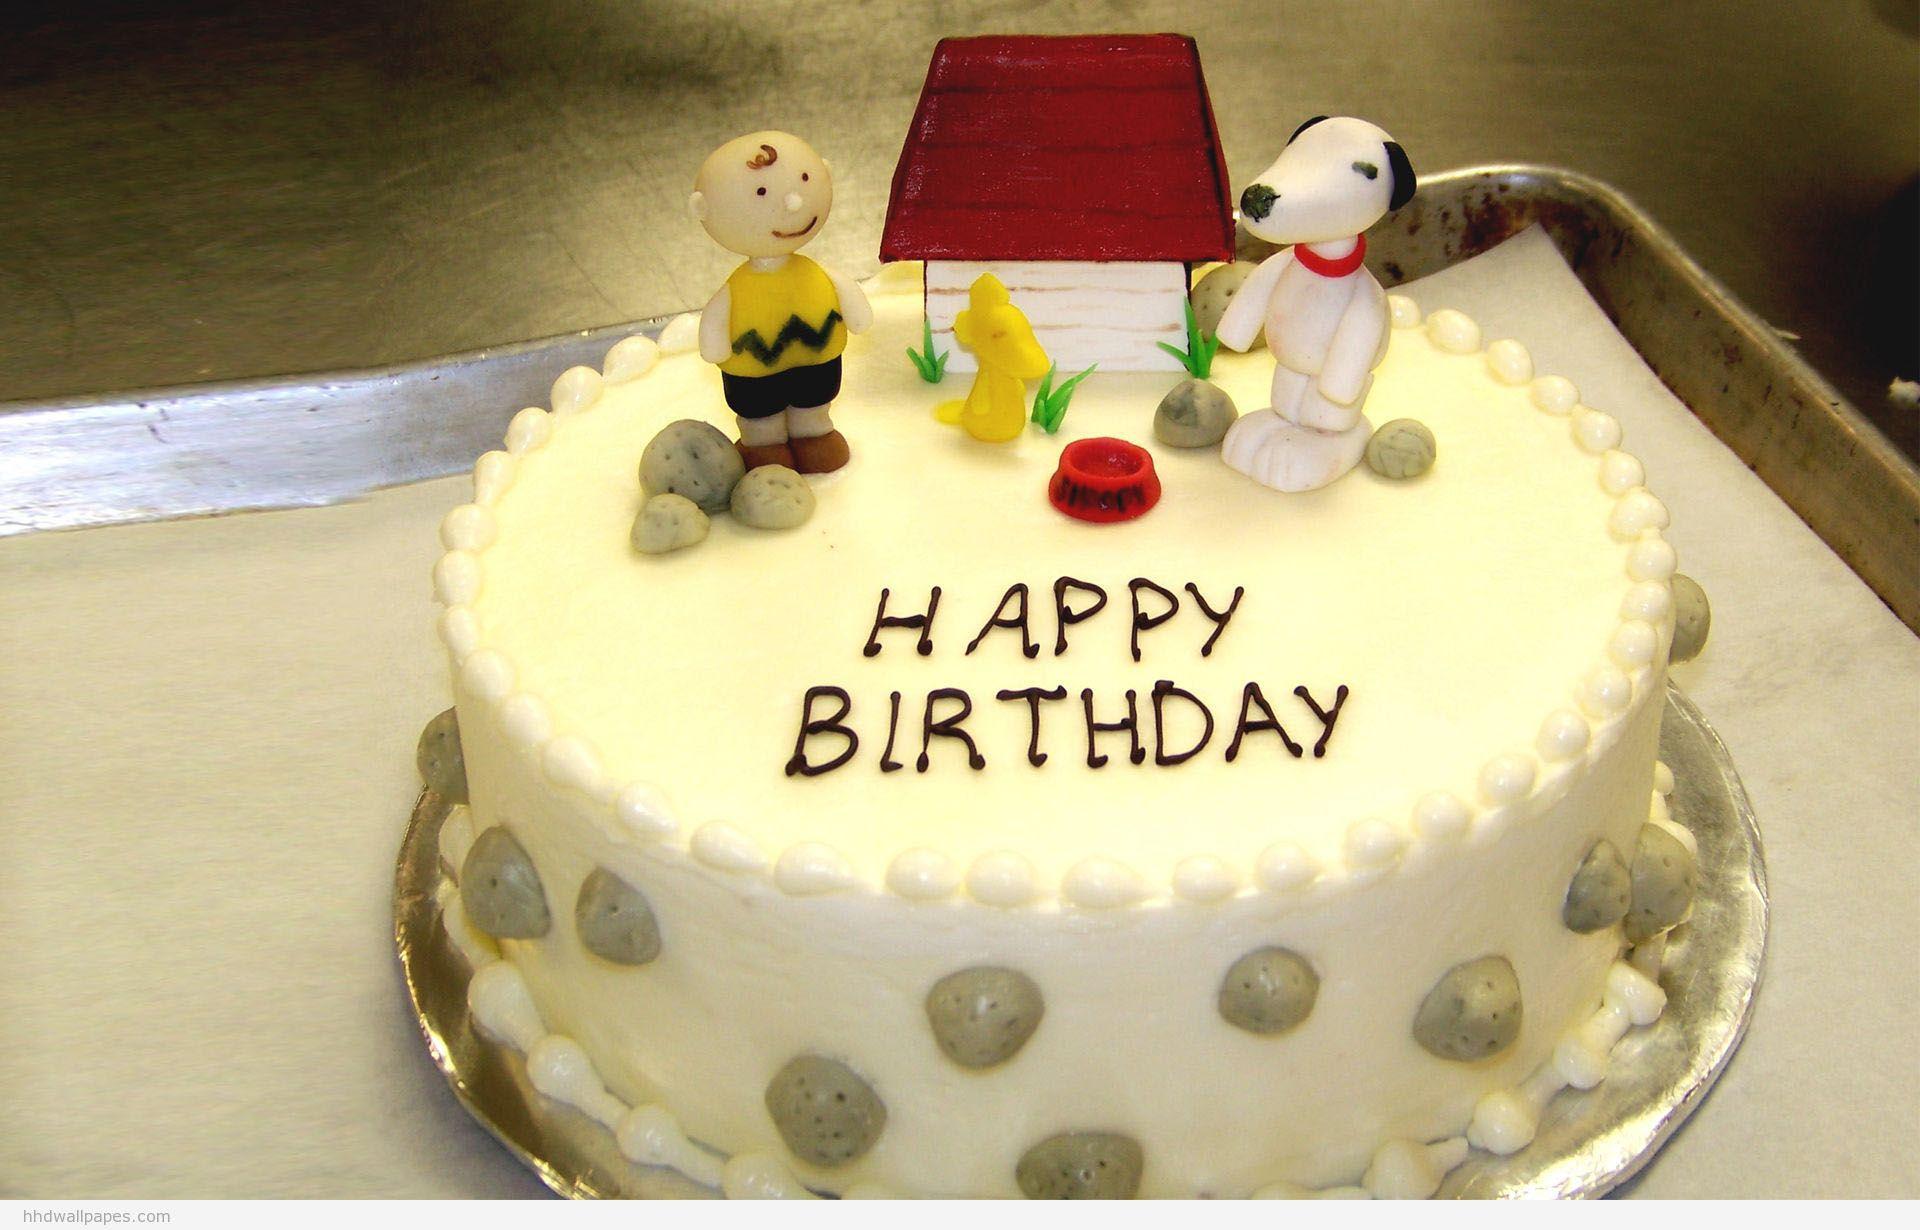 Birthday Wish Cake  Collection Of Free Birthday Wish Cake From - Birthday cake wishes quotes